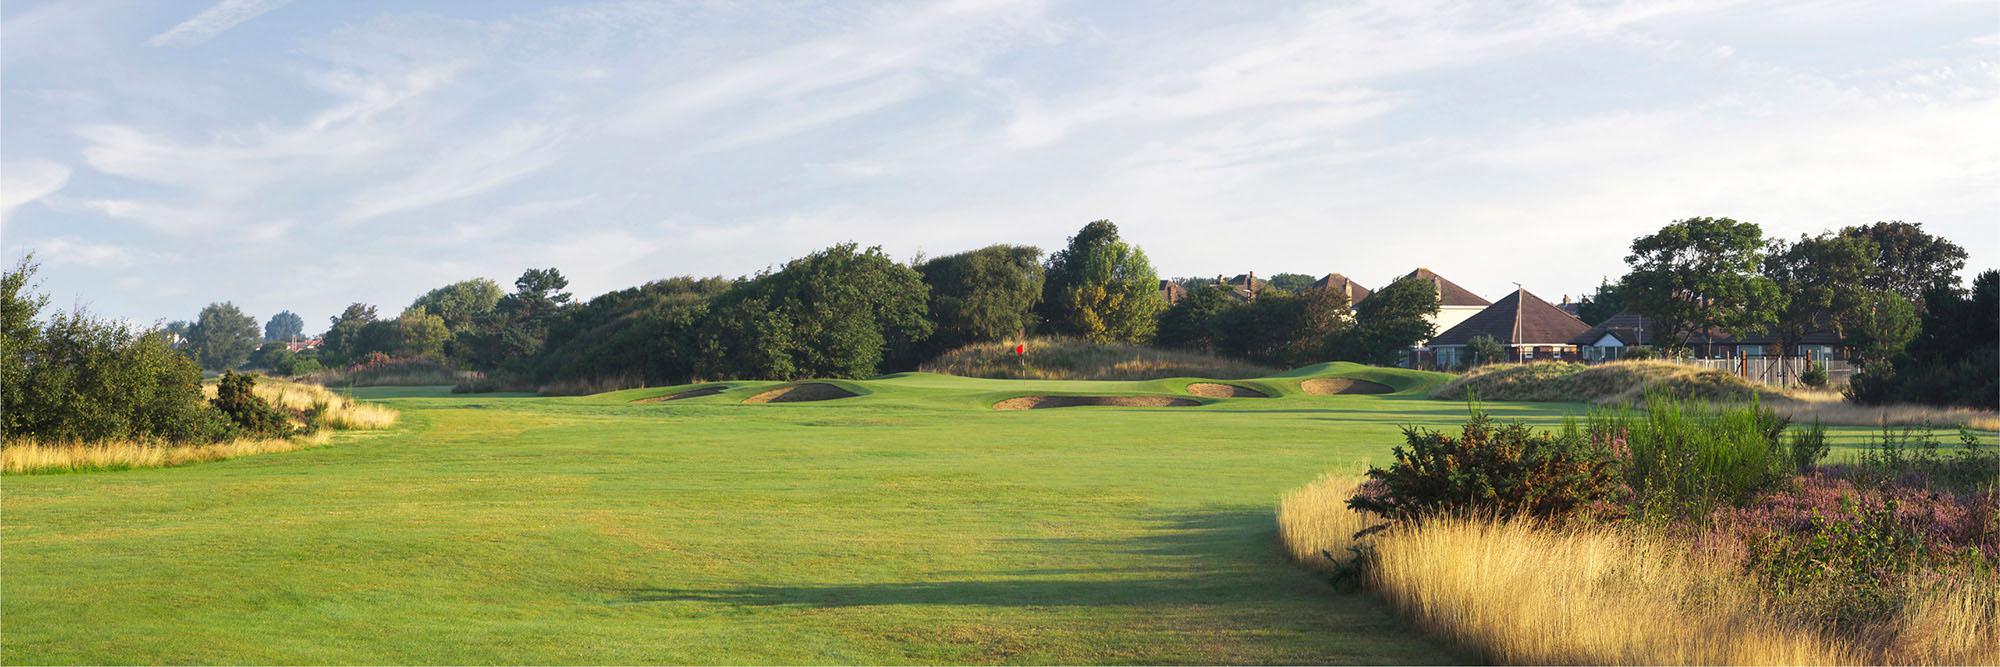 Golf Course Image - Royal Lytham & St Annes No. 12